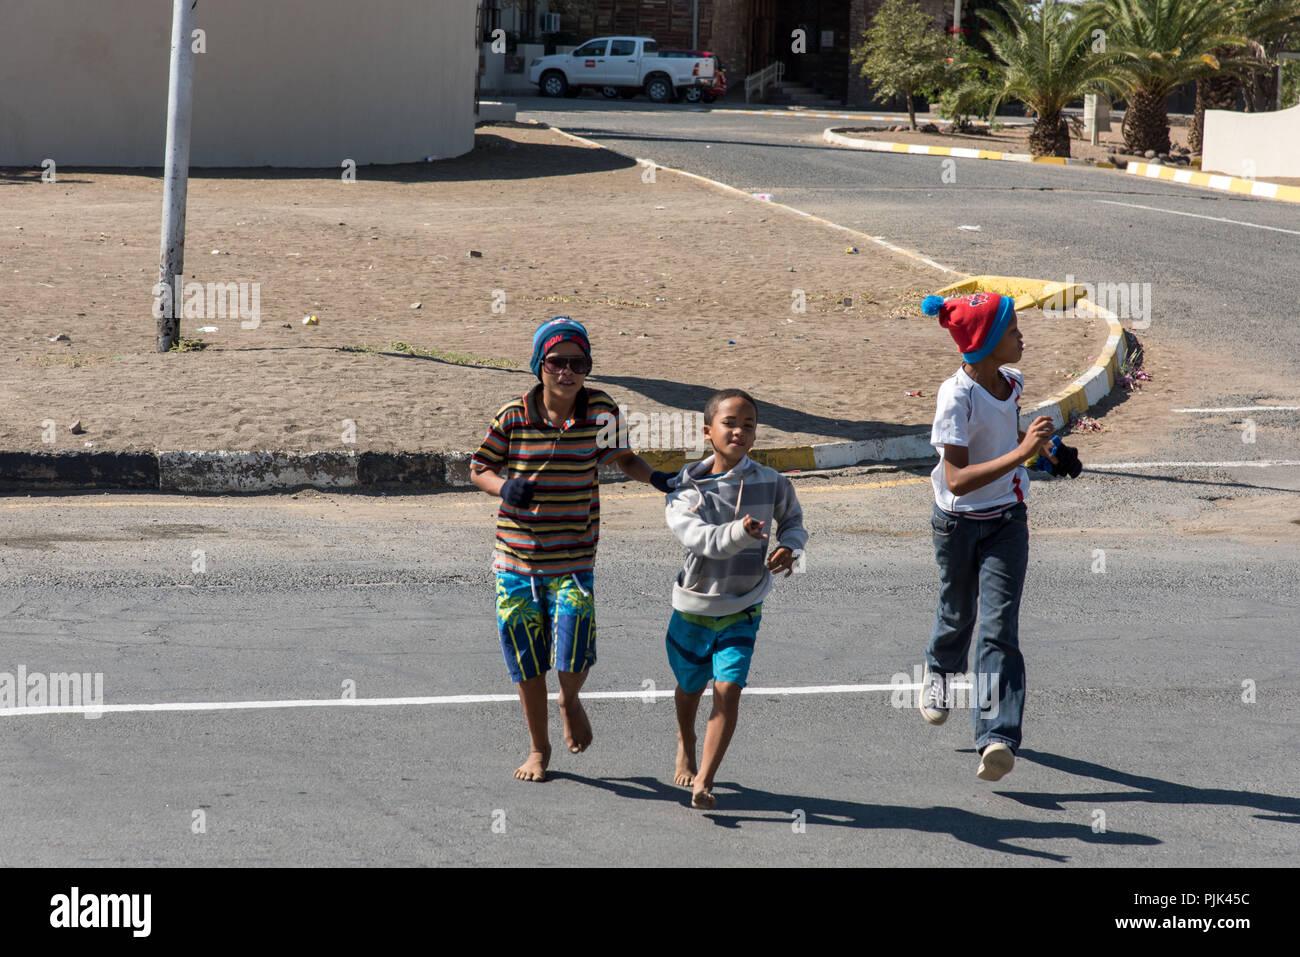 Children running crossing a street in Keetmanshoop, Namibia. Street scene in Keetmanshoop, Namibia - Stock Image